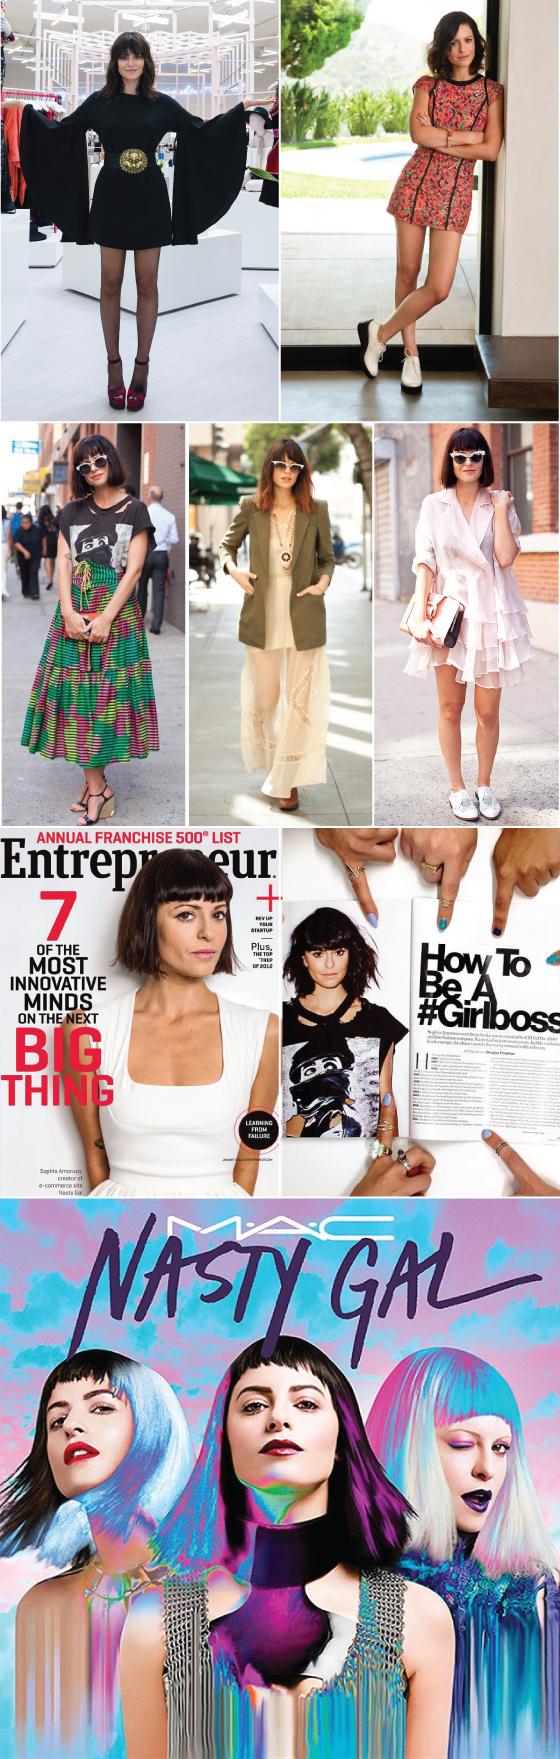 sophia-amoruso-youtube-livro-girl-boss-#girlboss-onde-comprar-resenha-sobre-nasty-gal-california-los-angeles-loja